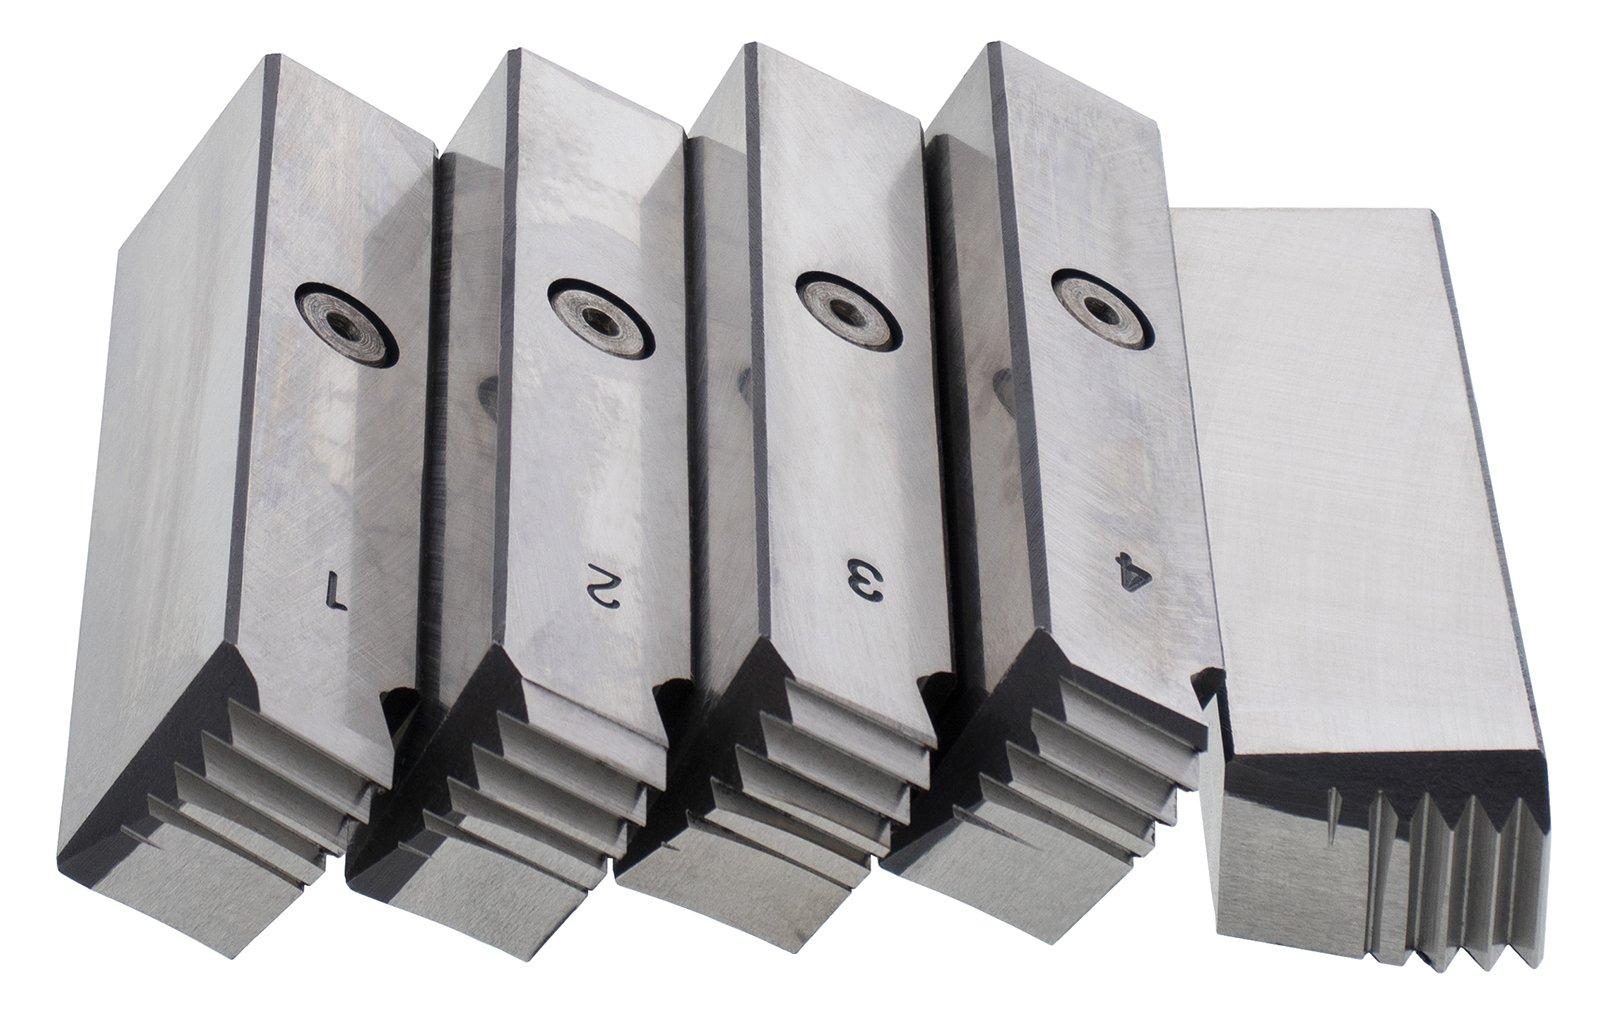 Steel Dragon Tools 38120 Pipe Dies for RIDGID 141 Receding Gear Threaders RH High-Speed Steel NPT 2-1/2-In. to 4-In.